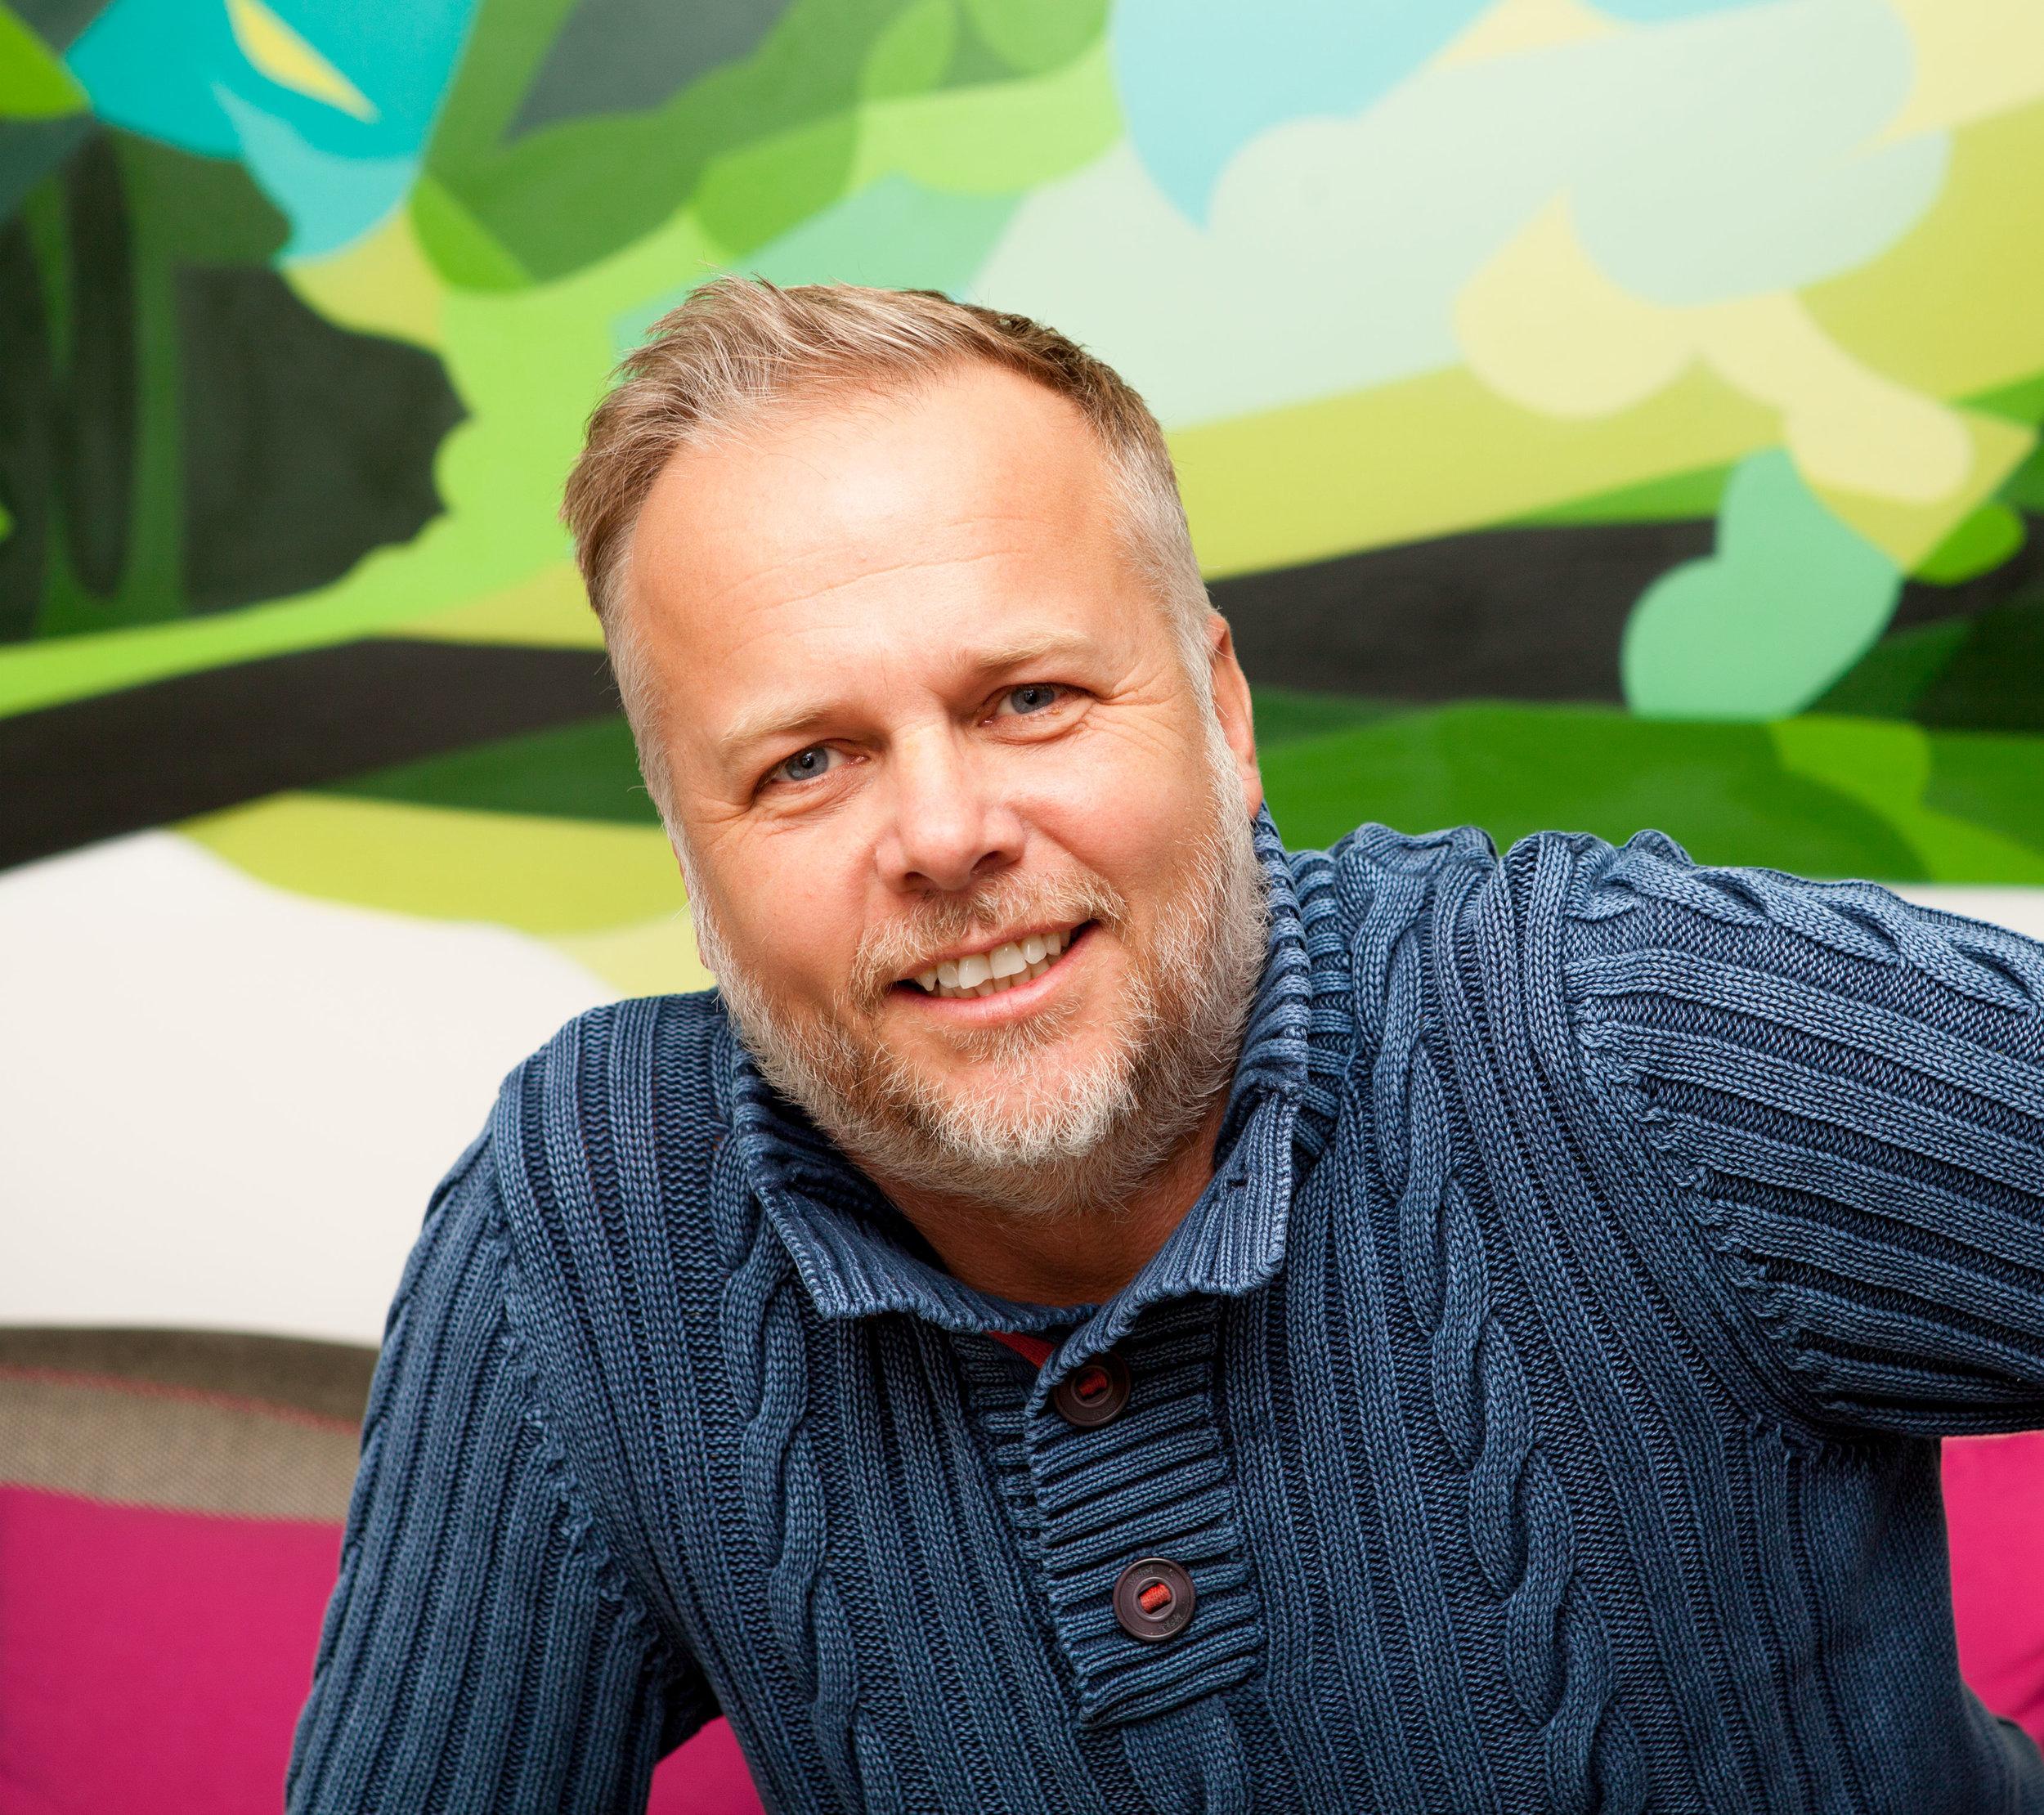 Graham Ebbs